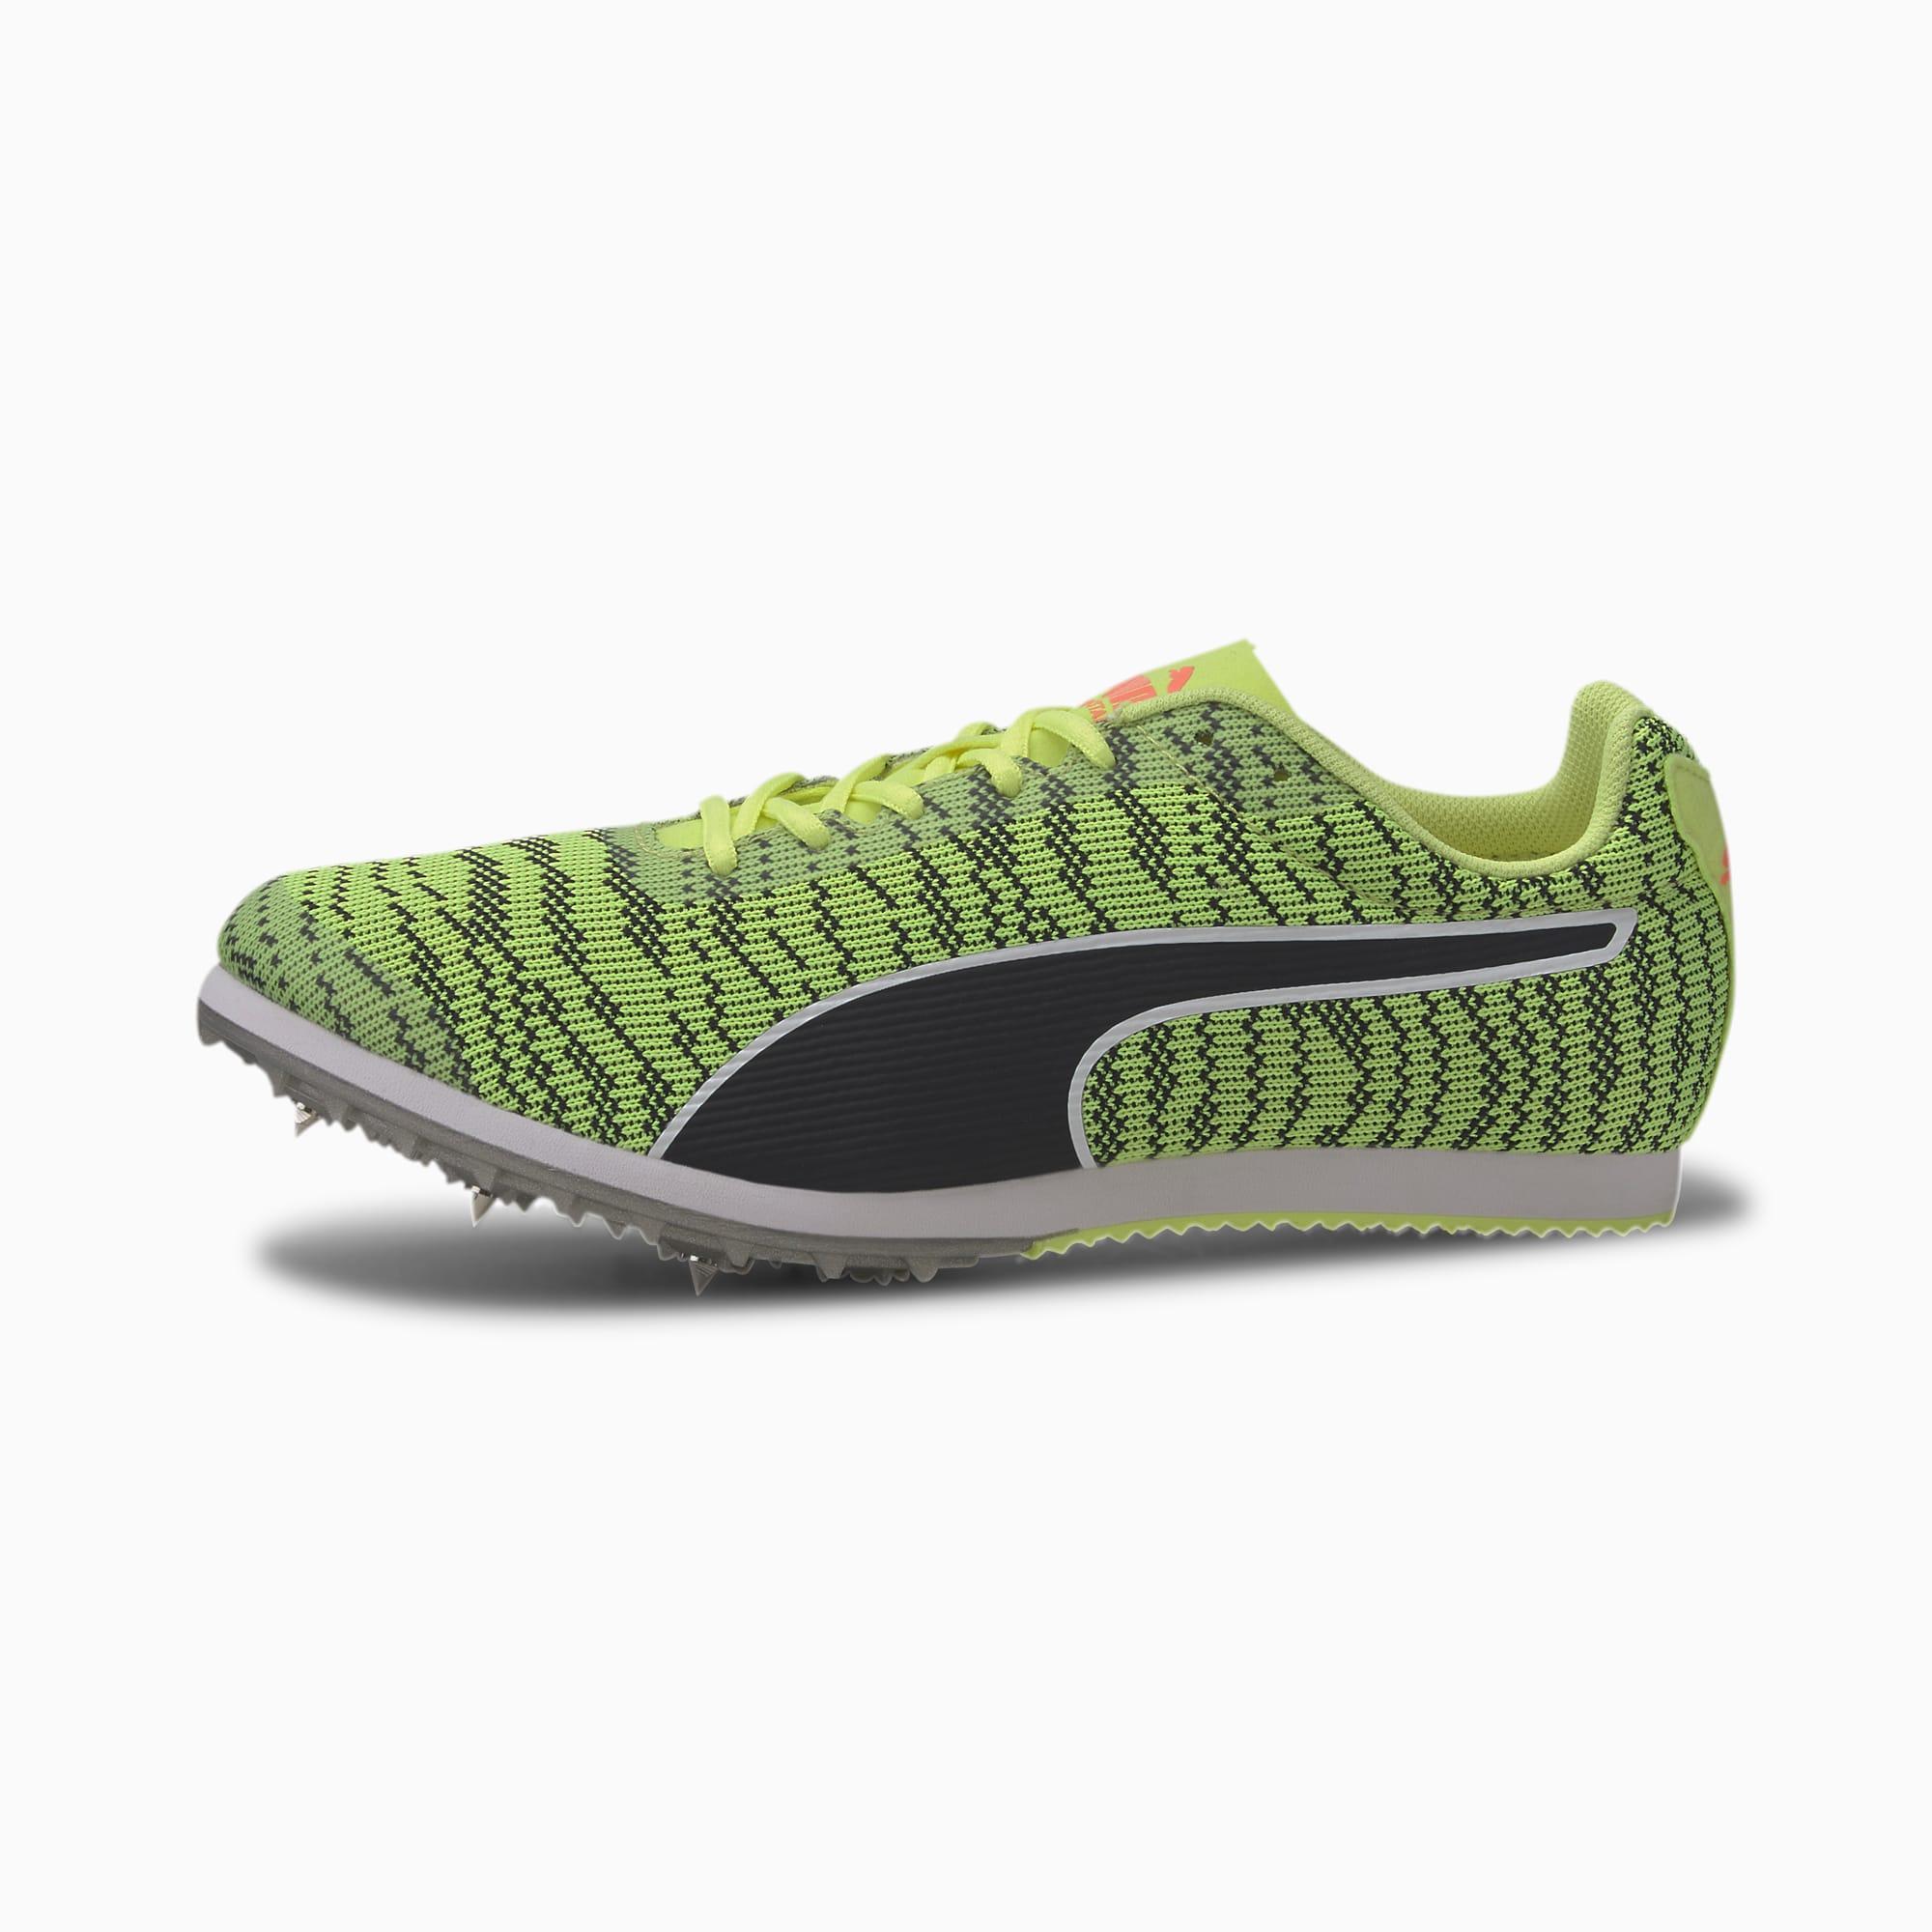 evoSPEED Star 6 Kids' Running Shoes